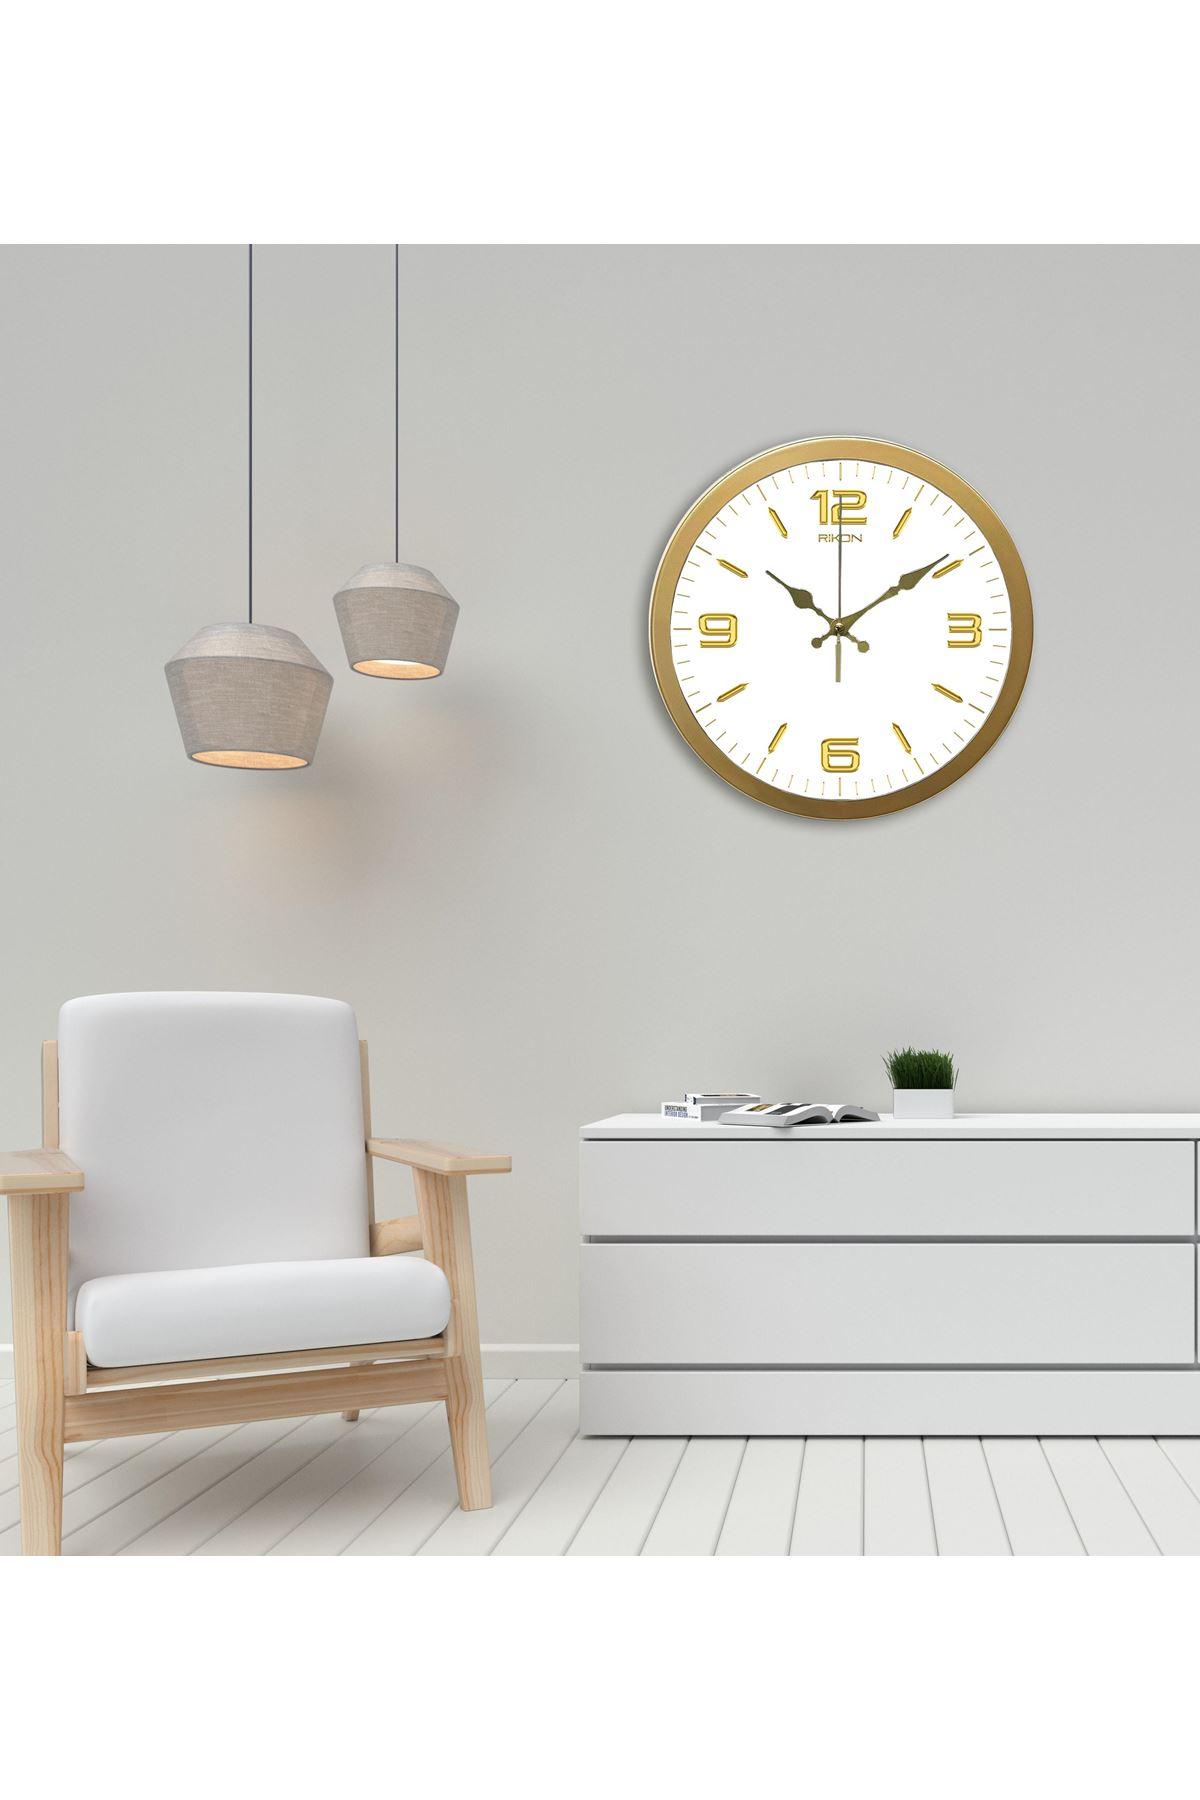 Rikon Metal Dekoratif Ofis Duvar Saati Klasik Gold White 35X35 Cm